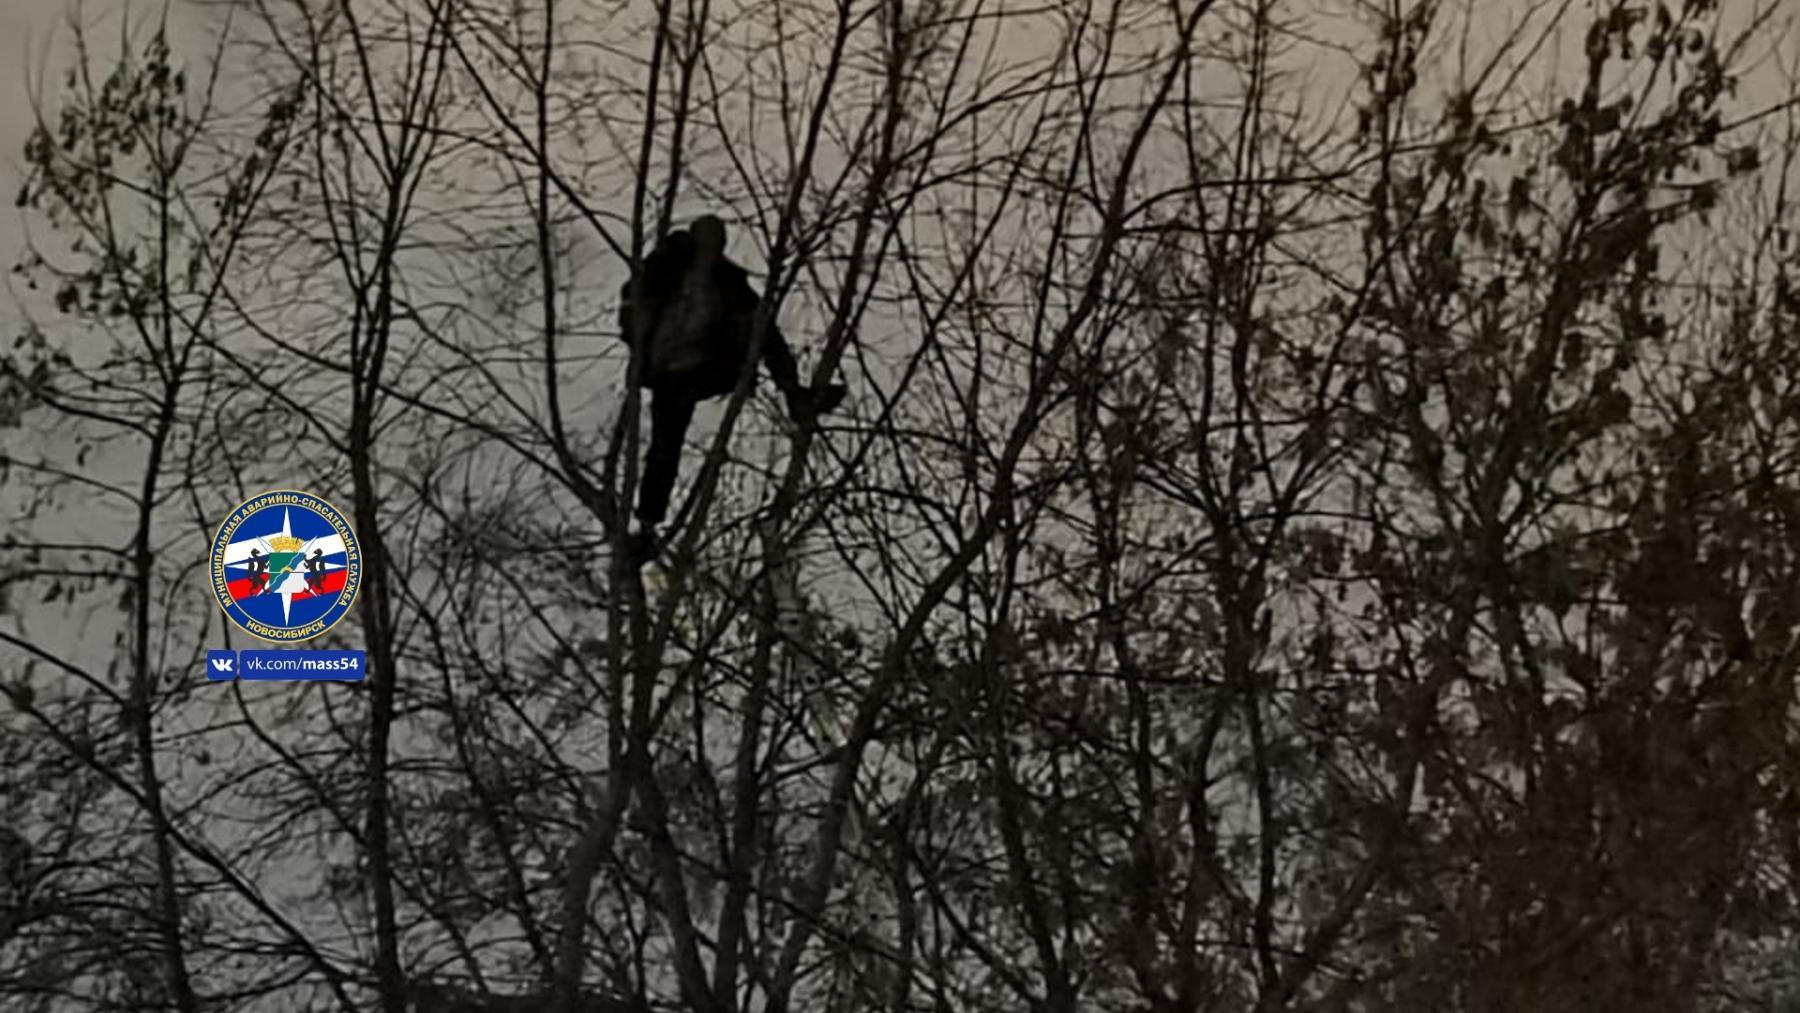 фото Неадекватного мужчину сняли с высокого дерева в Новосибирске 2